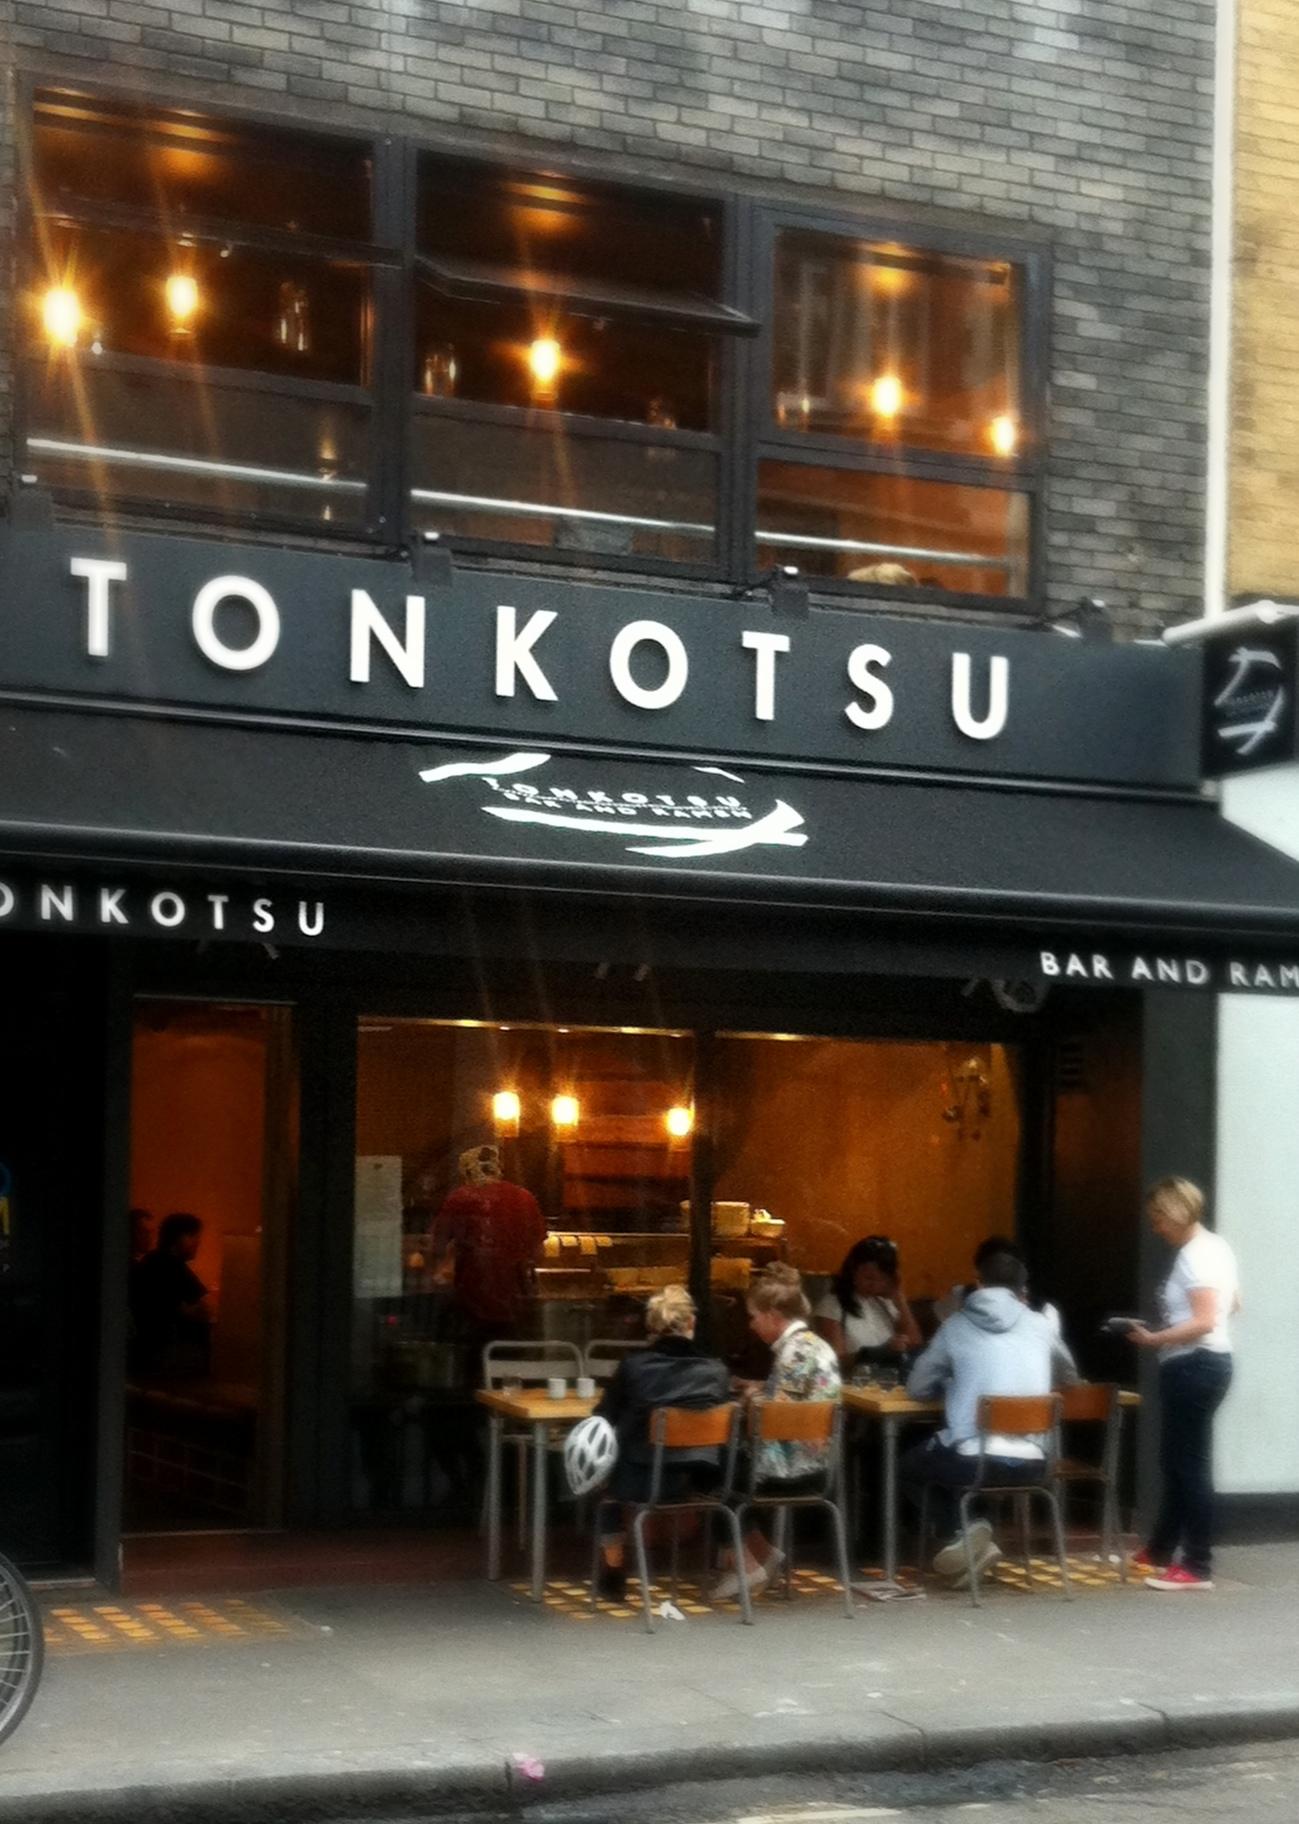 Tonkotsu Bar And Ramen 63 Dean Street London W1d 4qg